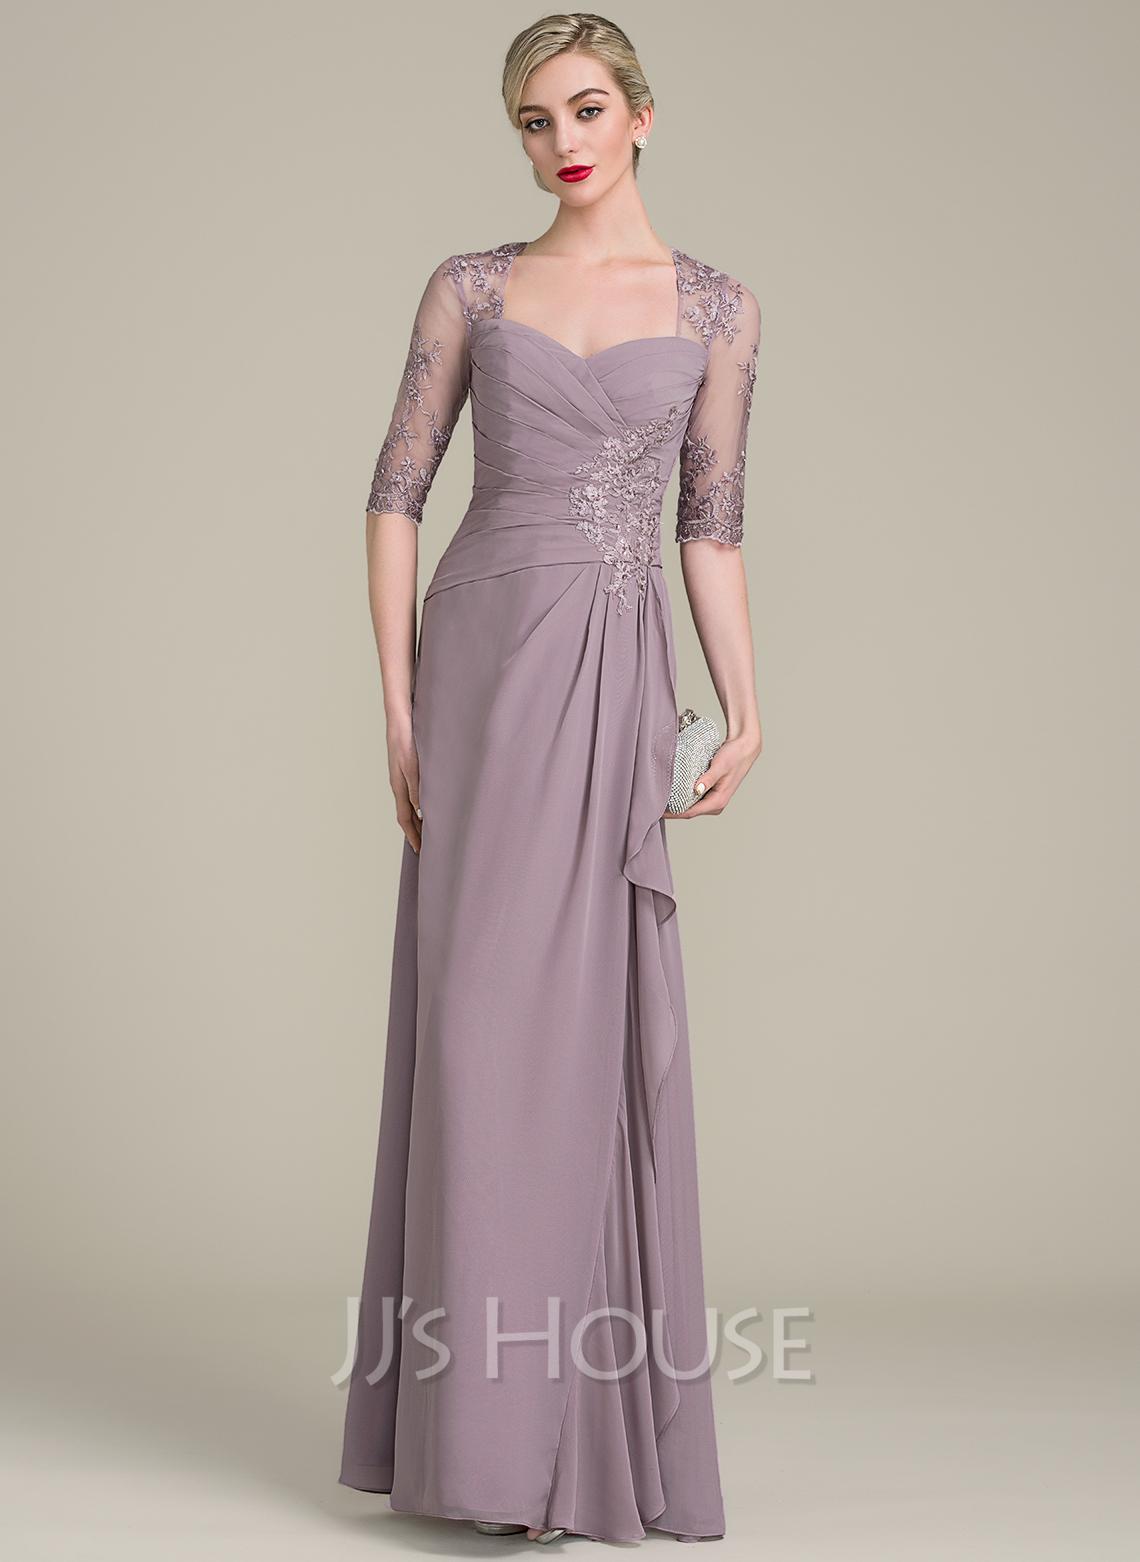 A-Line/Princess Sweetheart Floor-Length Chiffon Evening Dress With Beading Sequins Cascading Ruffles